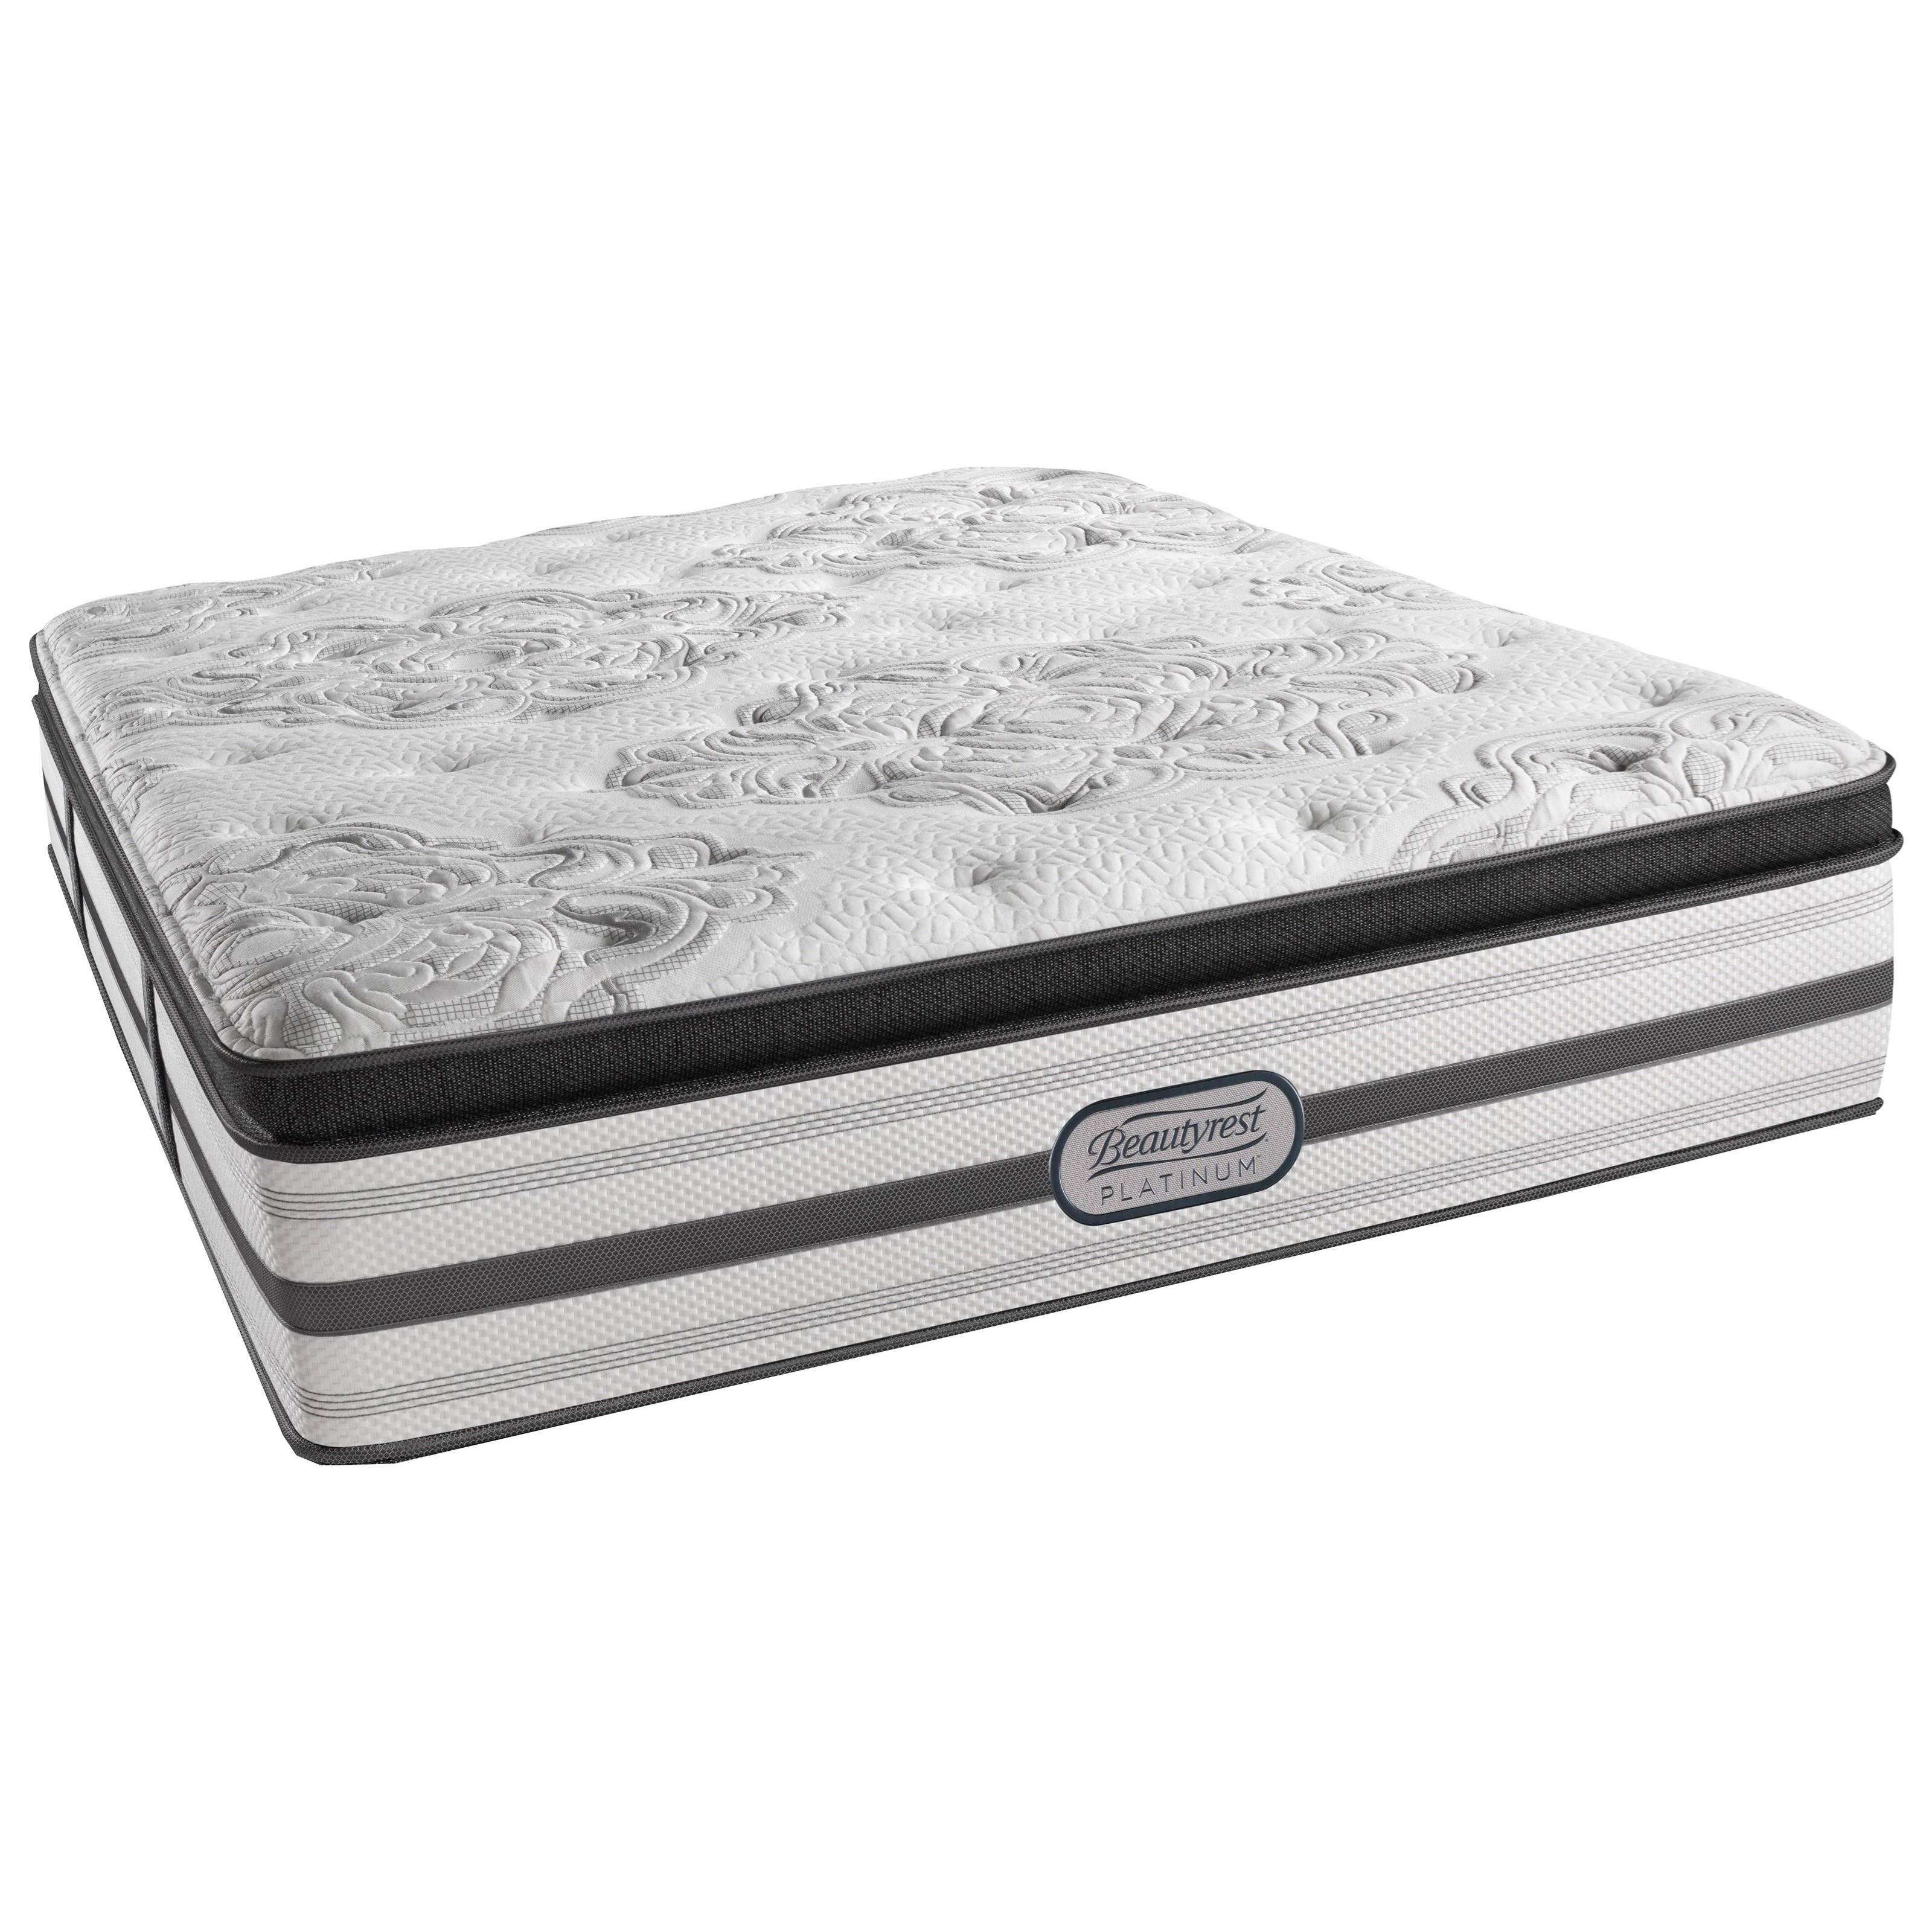 Beautyrest Platinum Gabriella Cal King Plush Pillow Top Adjustable Set - Item Number: LV3PLPT-CK+2xSM3-SPCK